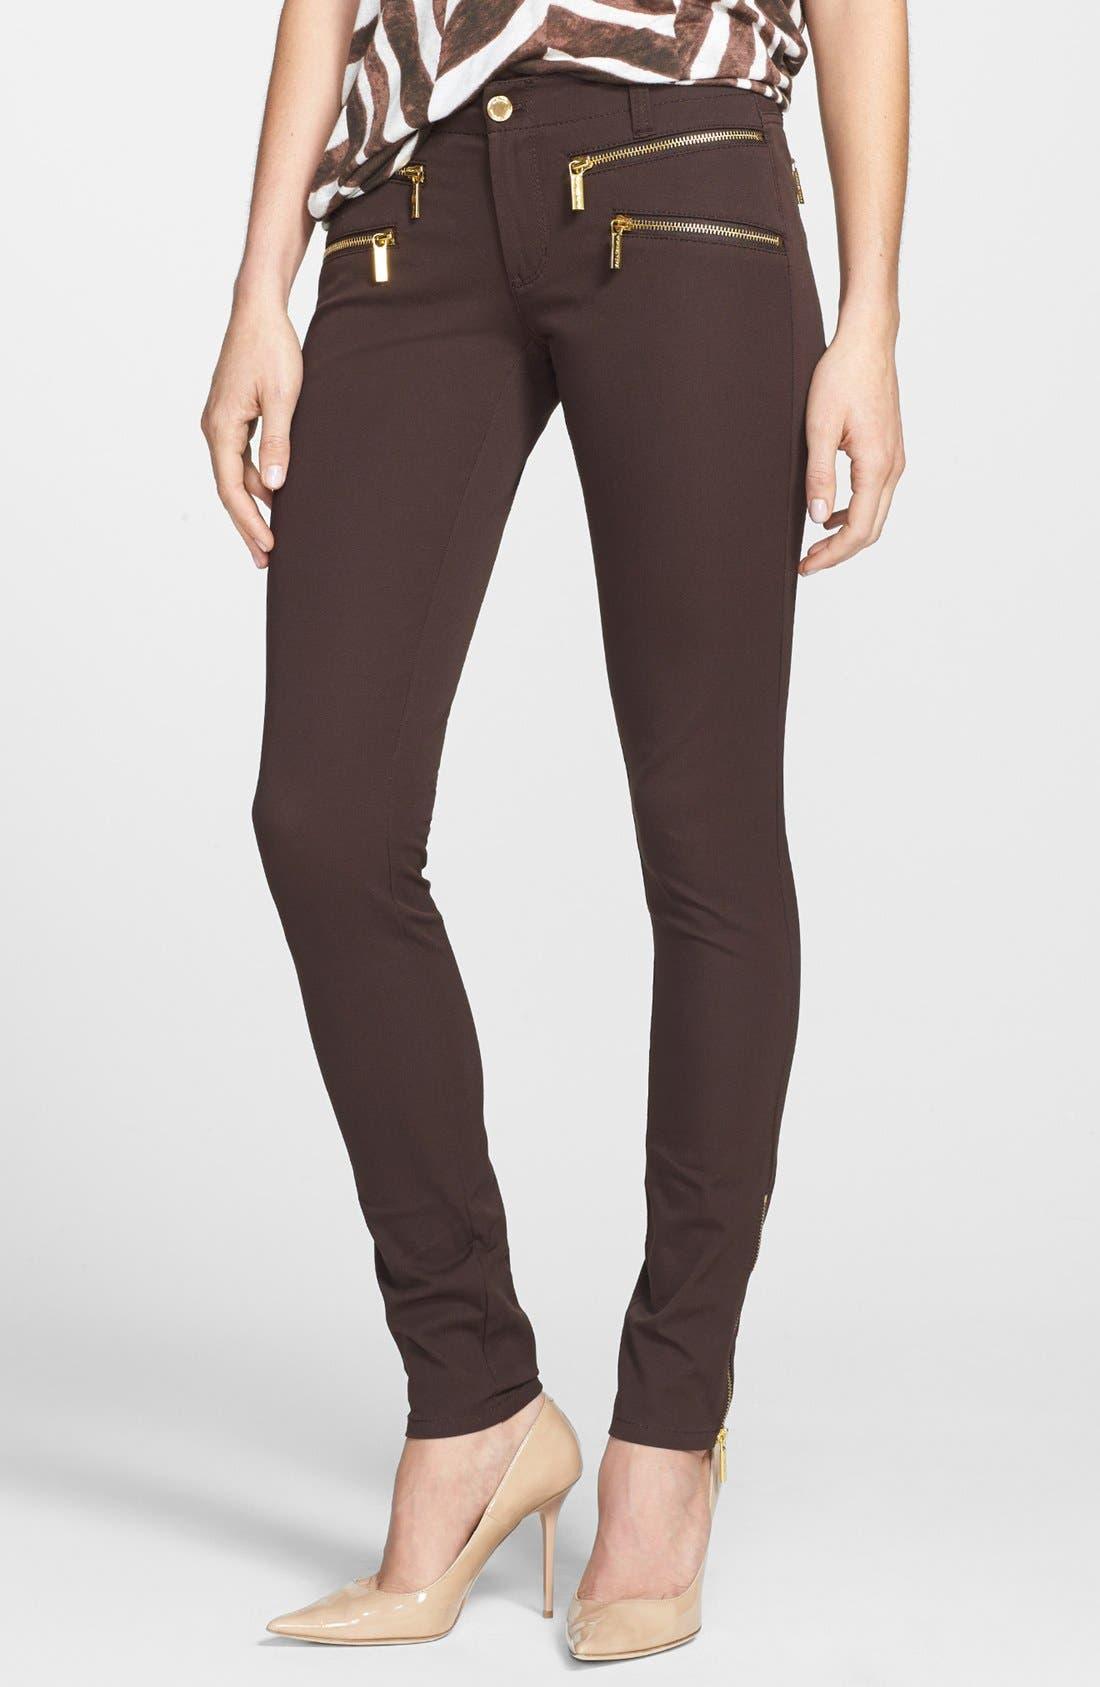 Alternate Image 1 Selected - MICHAEL Michael Kors 'Rocker' Zip Twill Pants